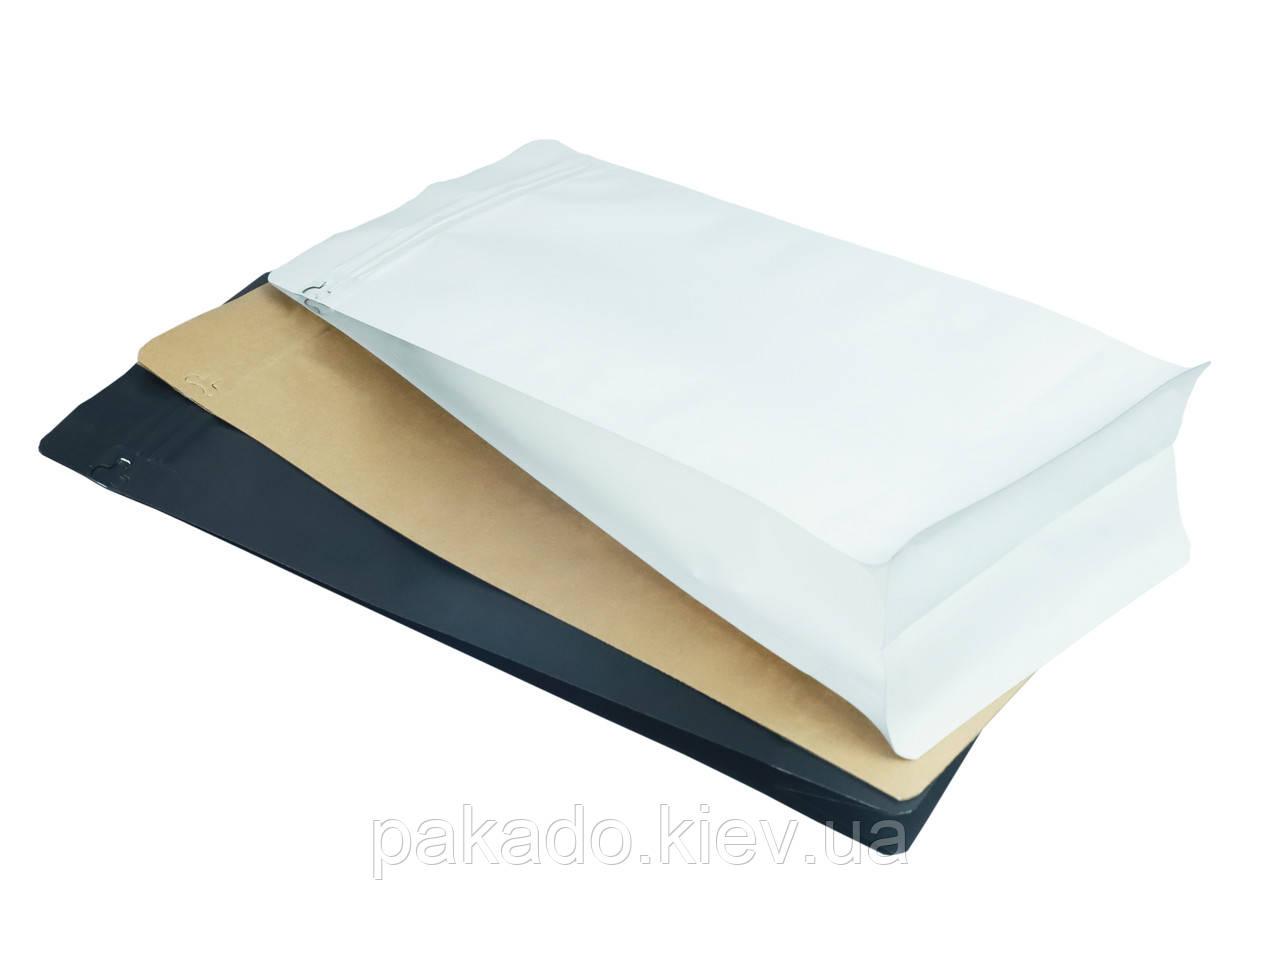 Пакет с плоским дном 155х195х60 (250г) БЕЛЫЙ КРАФТ (без металлизации) zip-замок боковой